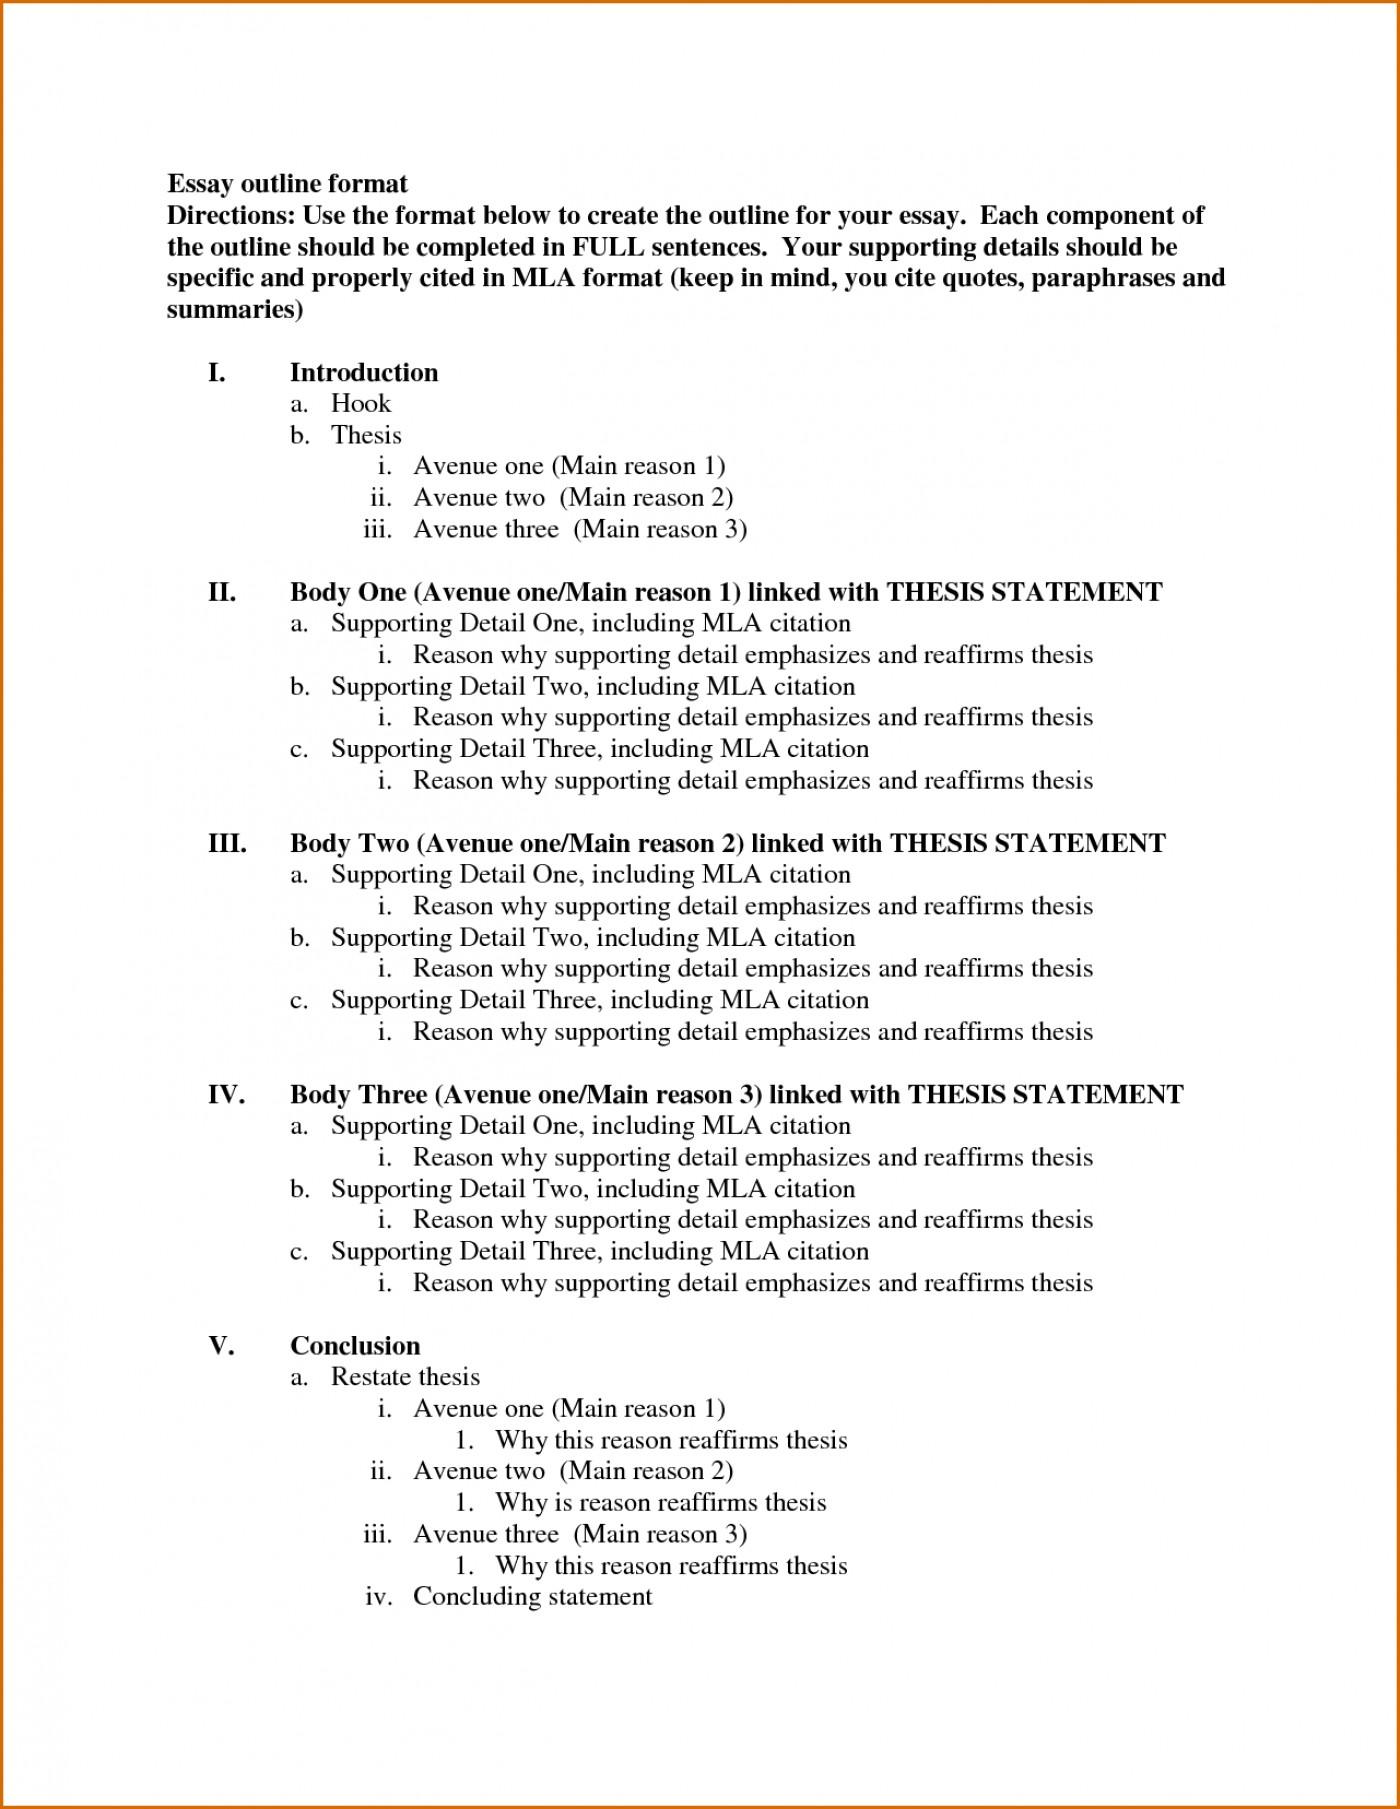 003 Essay Example Outline Template How To Do An Astounding For Write A Formal Argumentative Create Persuasive Make Informative 1400